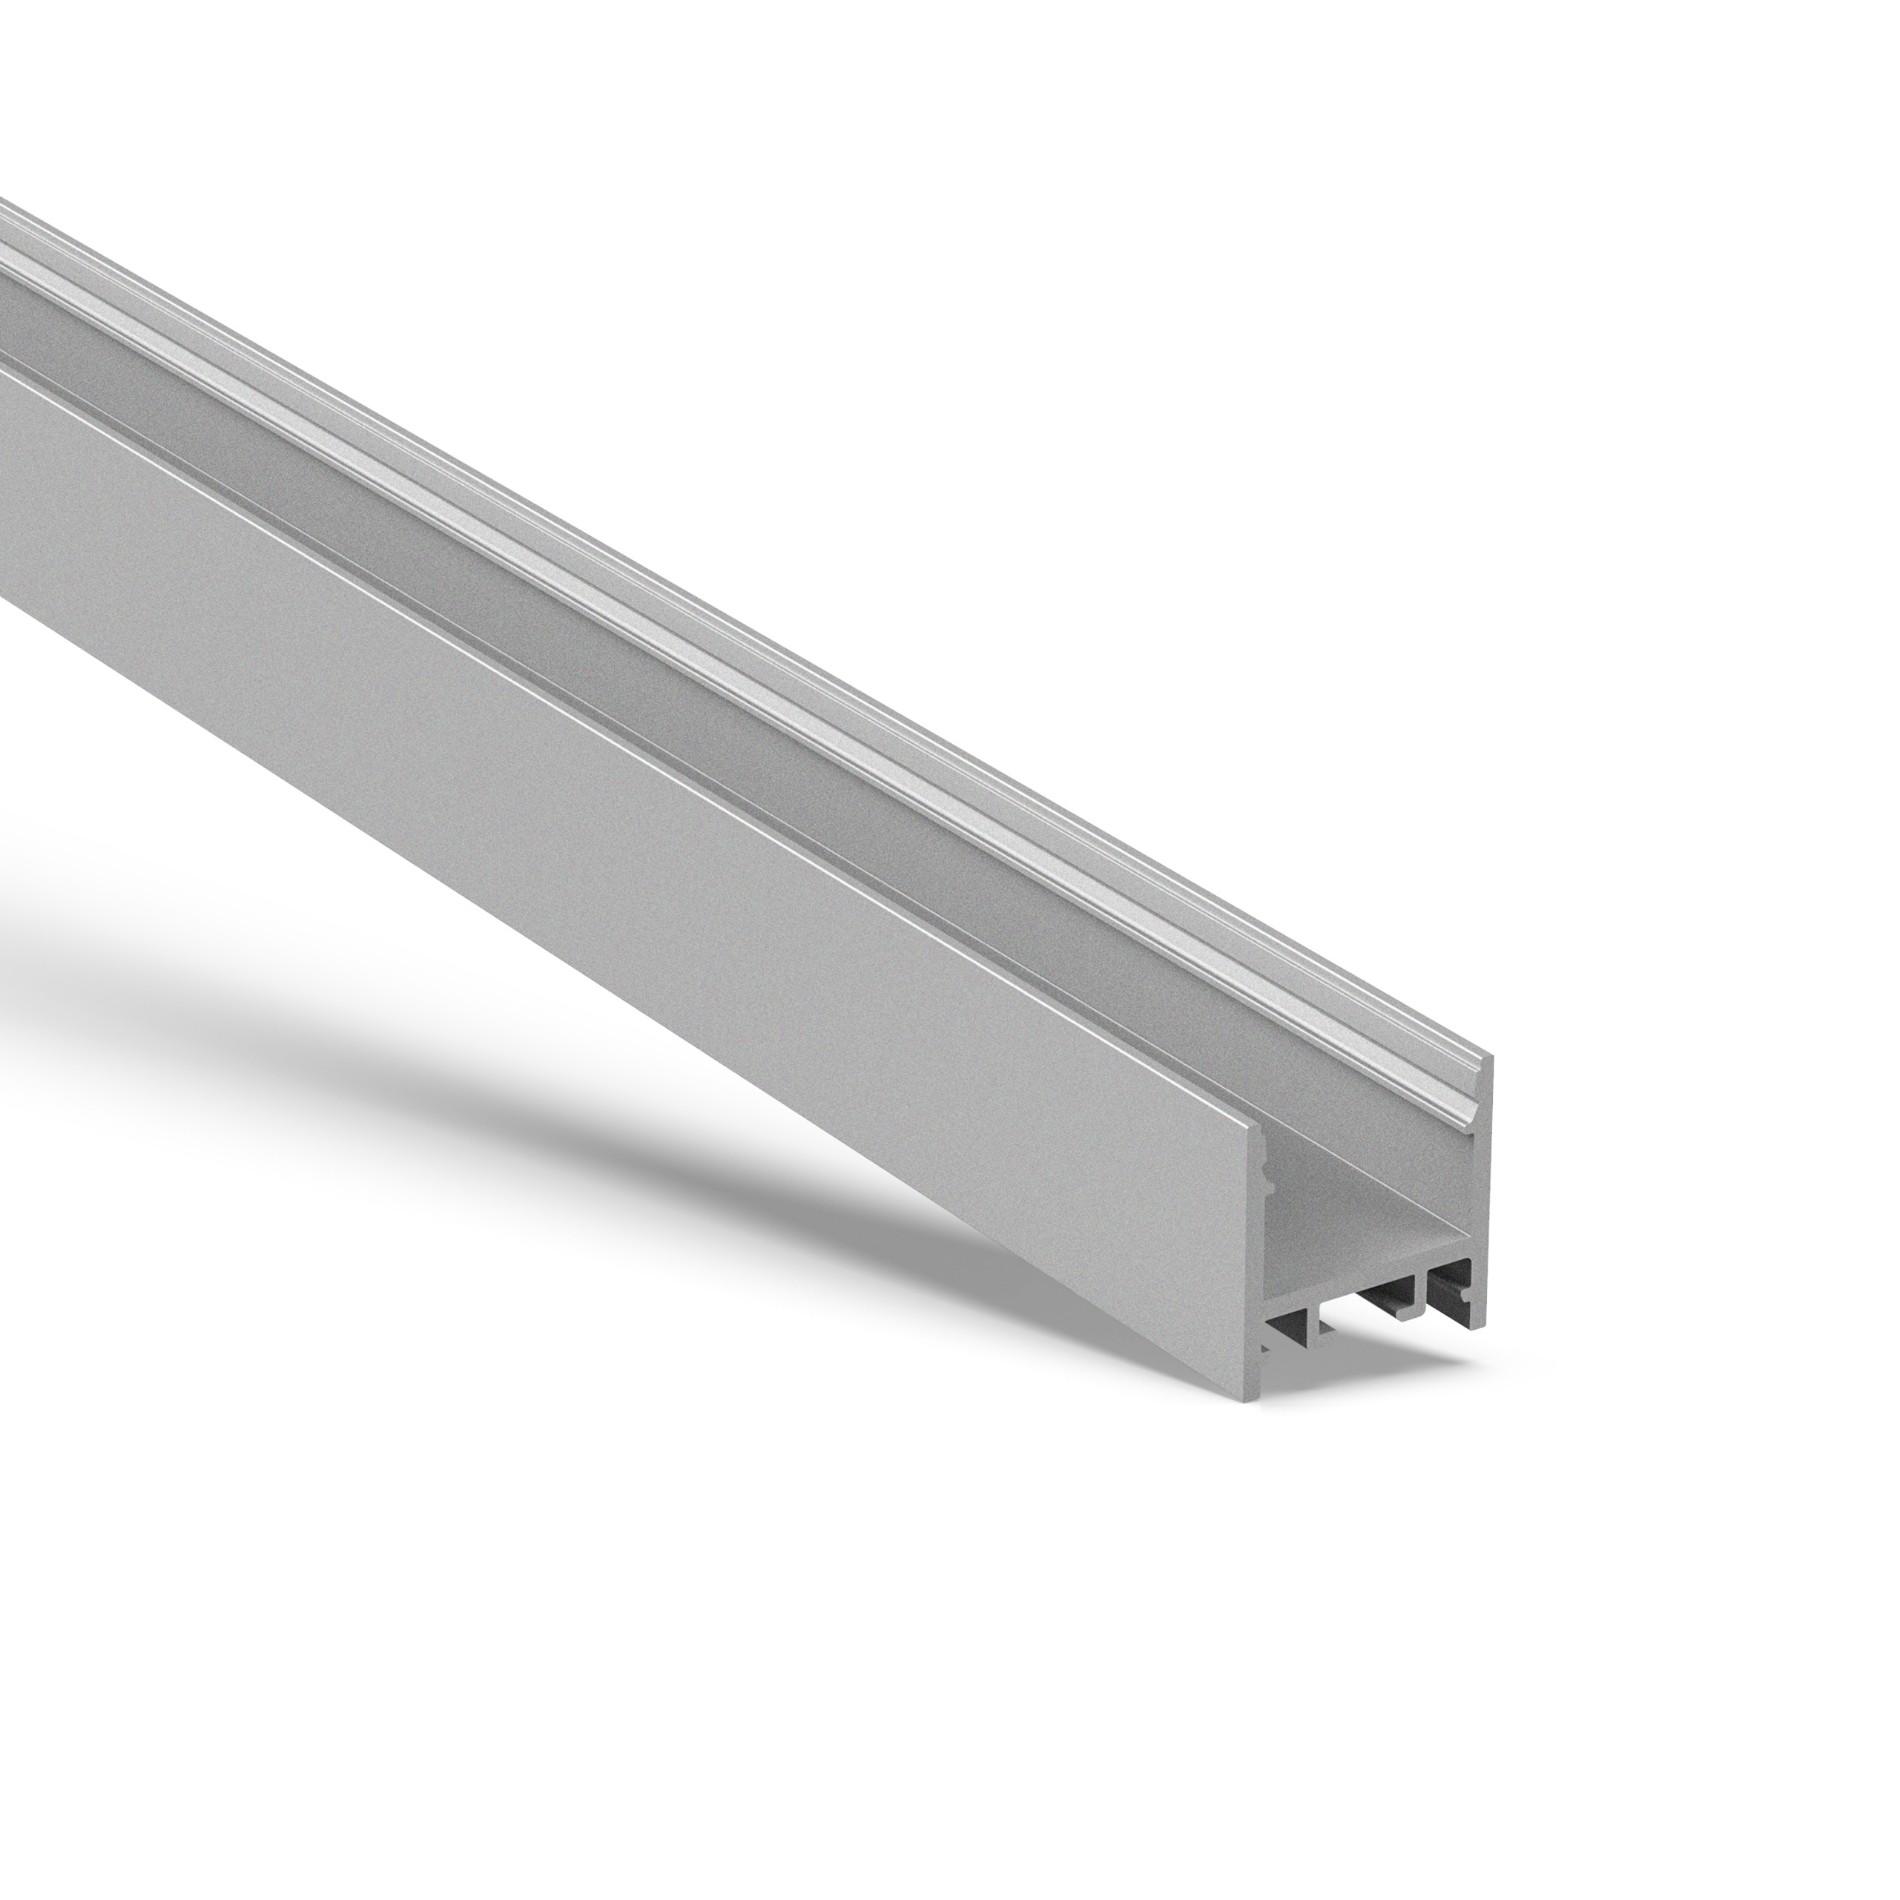 US20 Surface square led profile 20x20mm